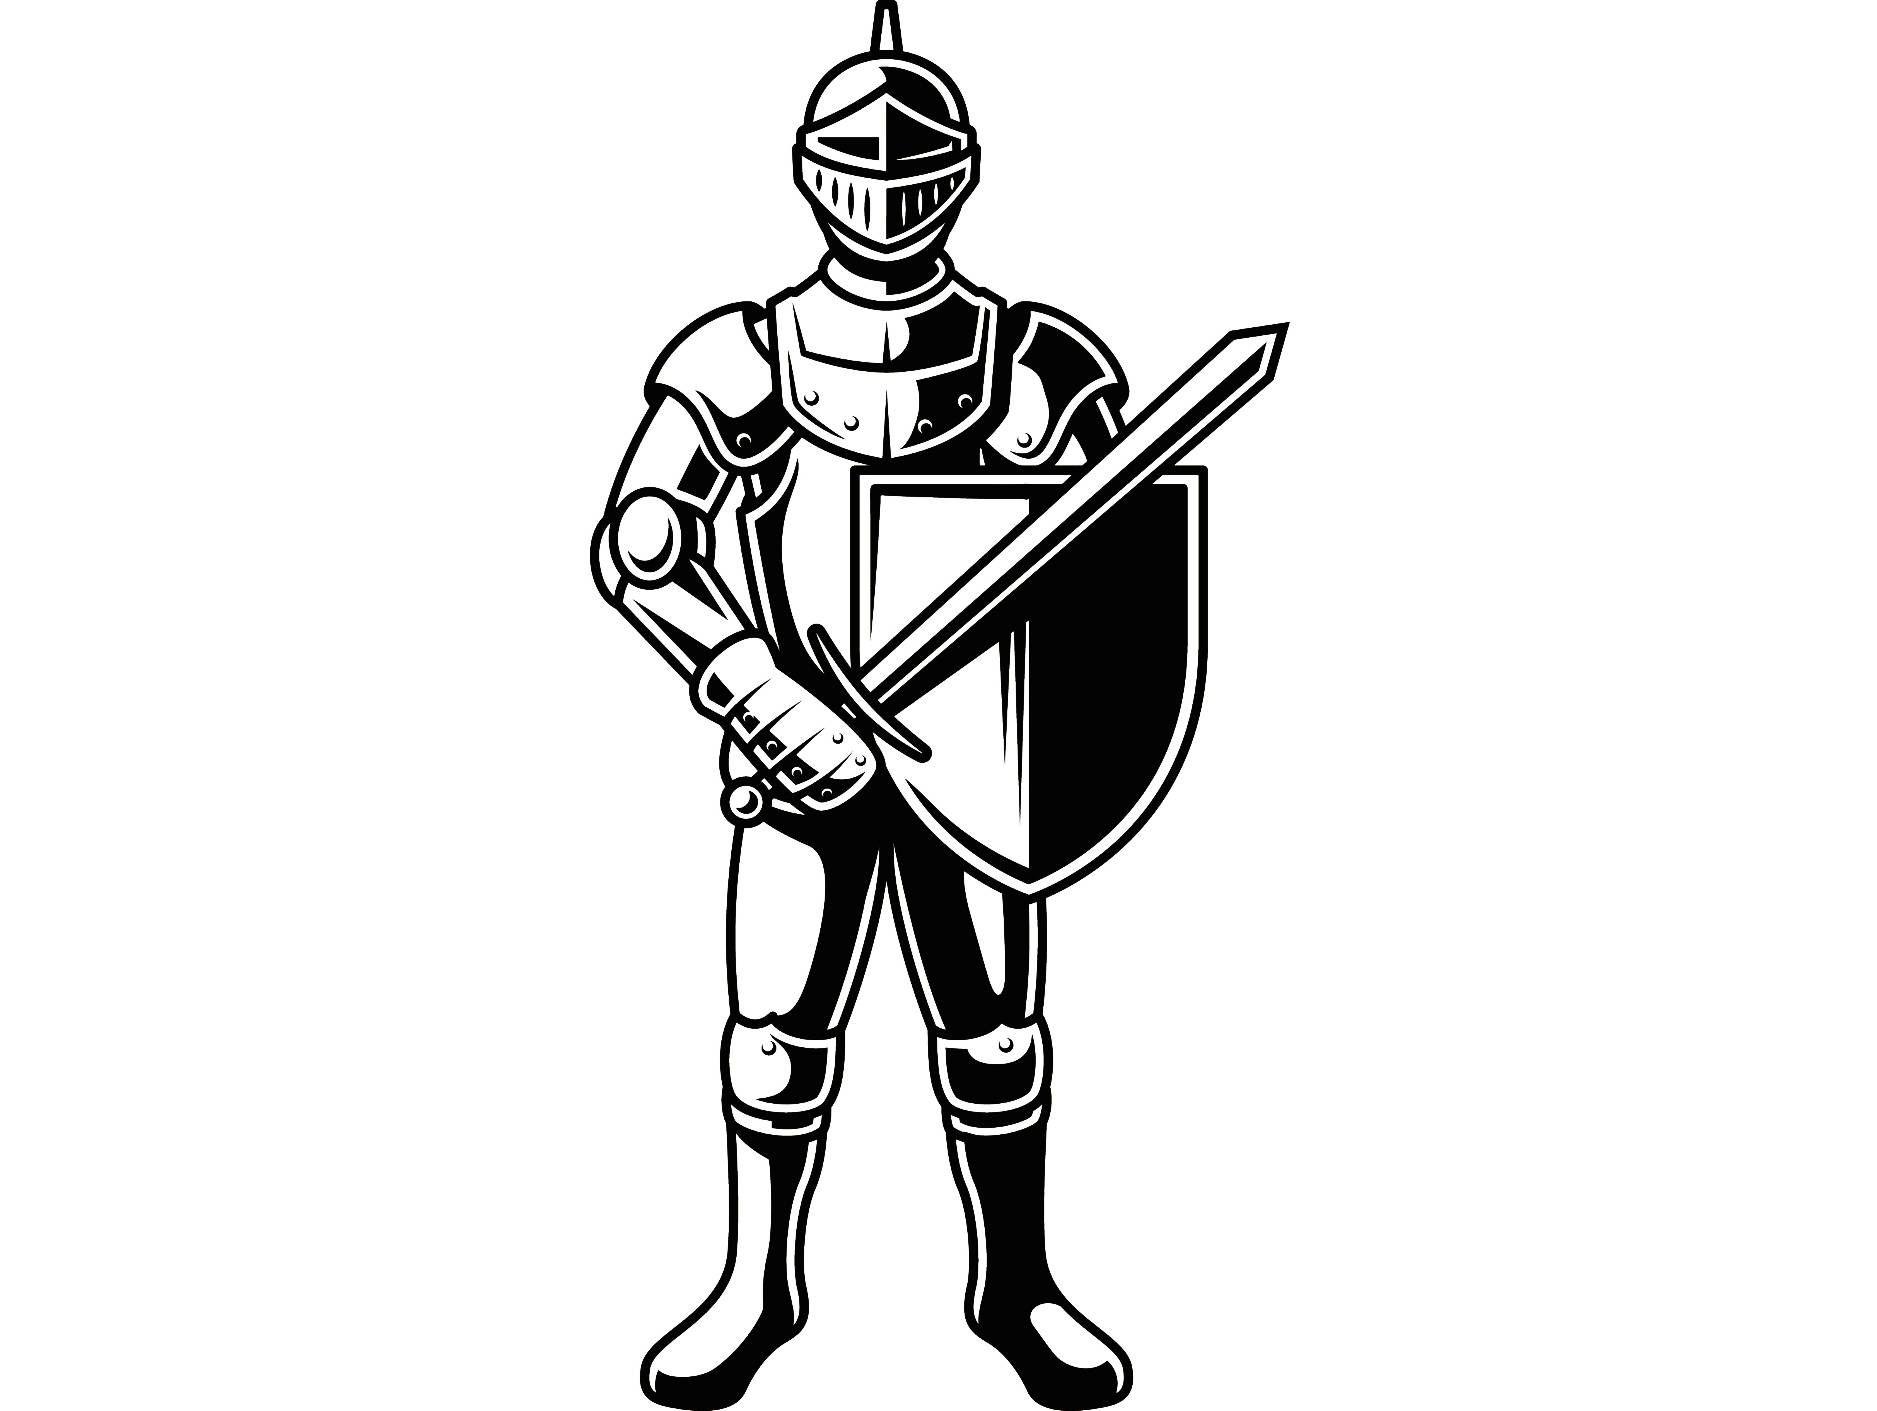 trojan sword clipart outline - HD1877×1411